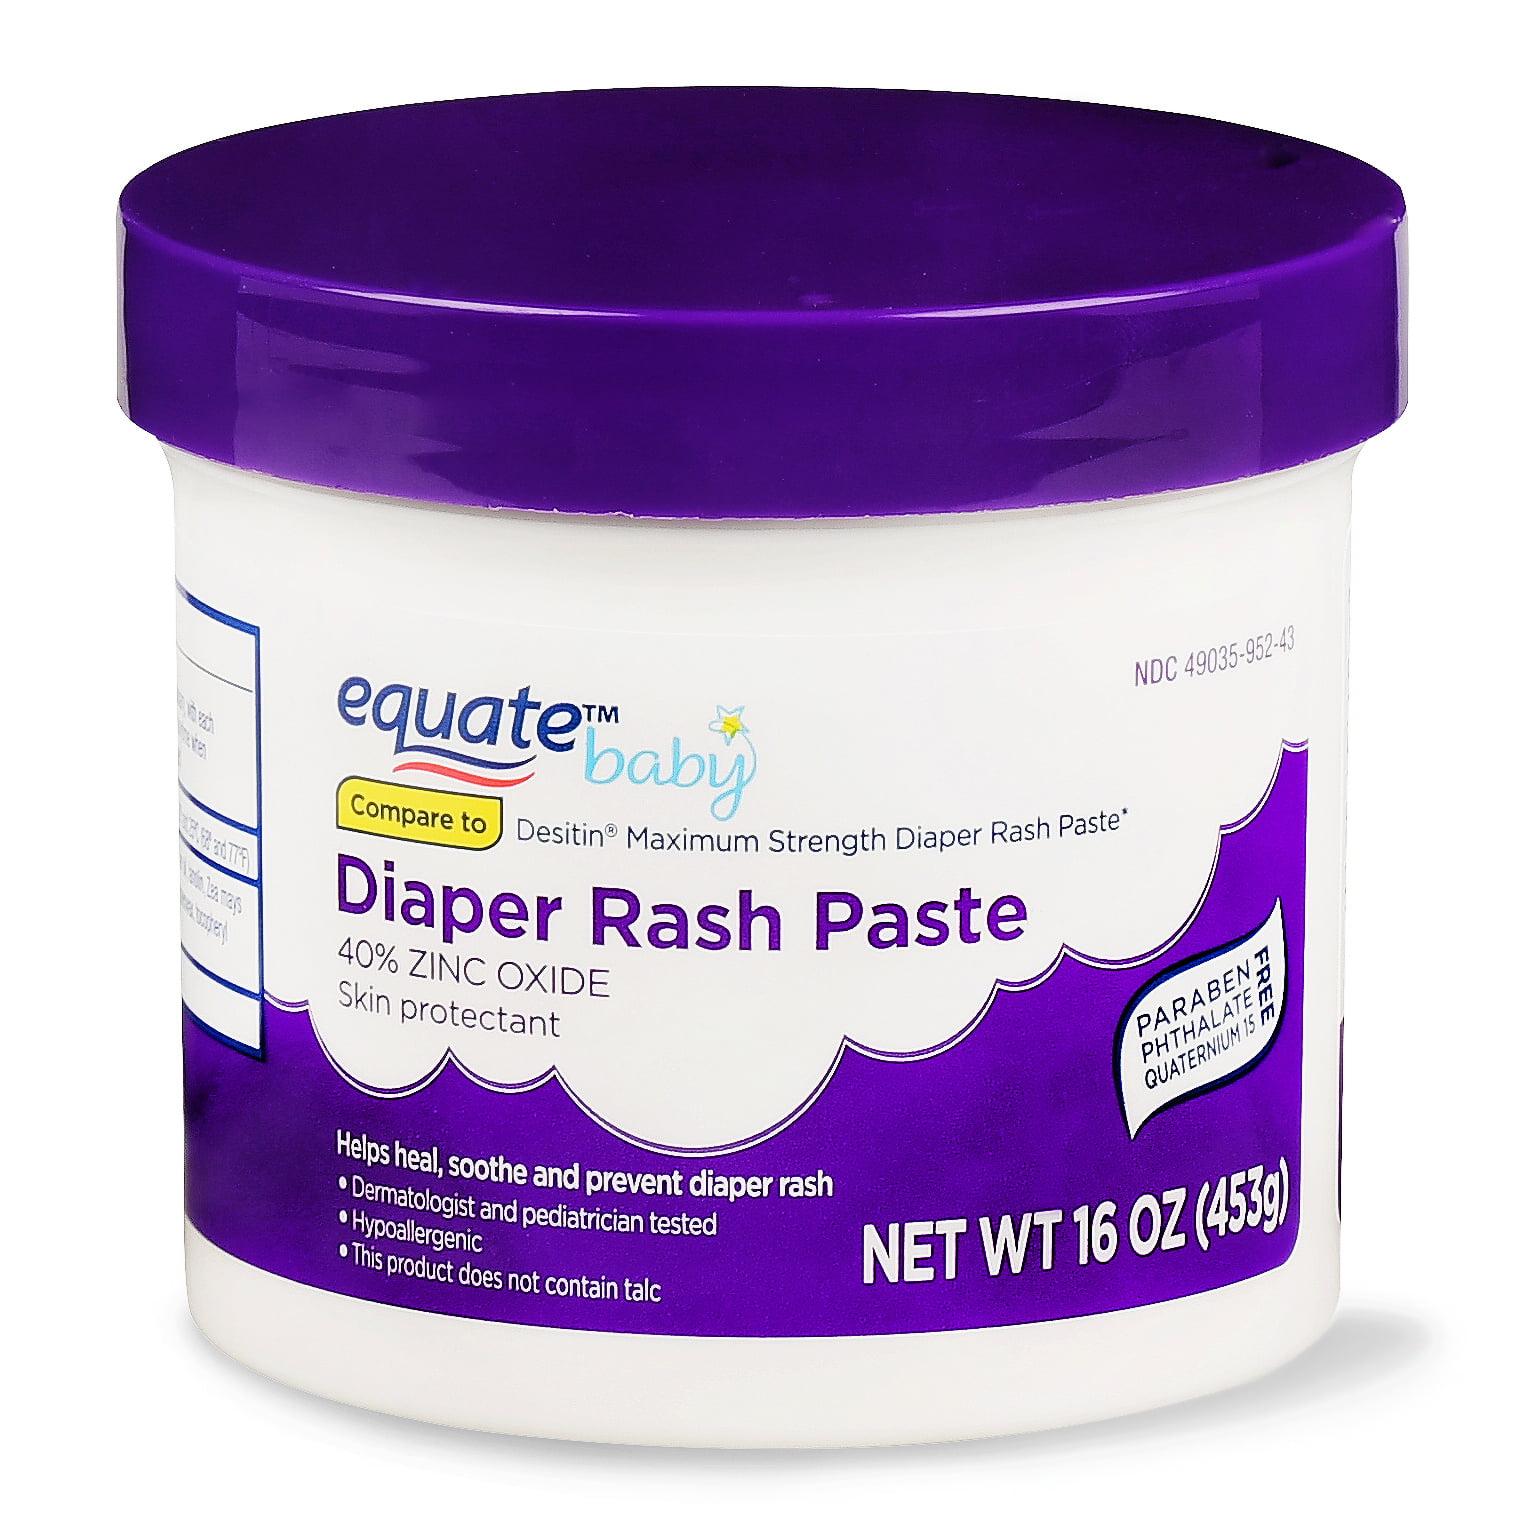 Equate Baby Diaper Rash Paste, 16 Oz